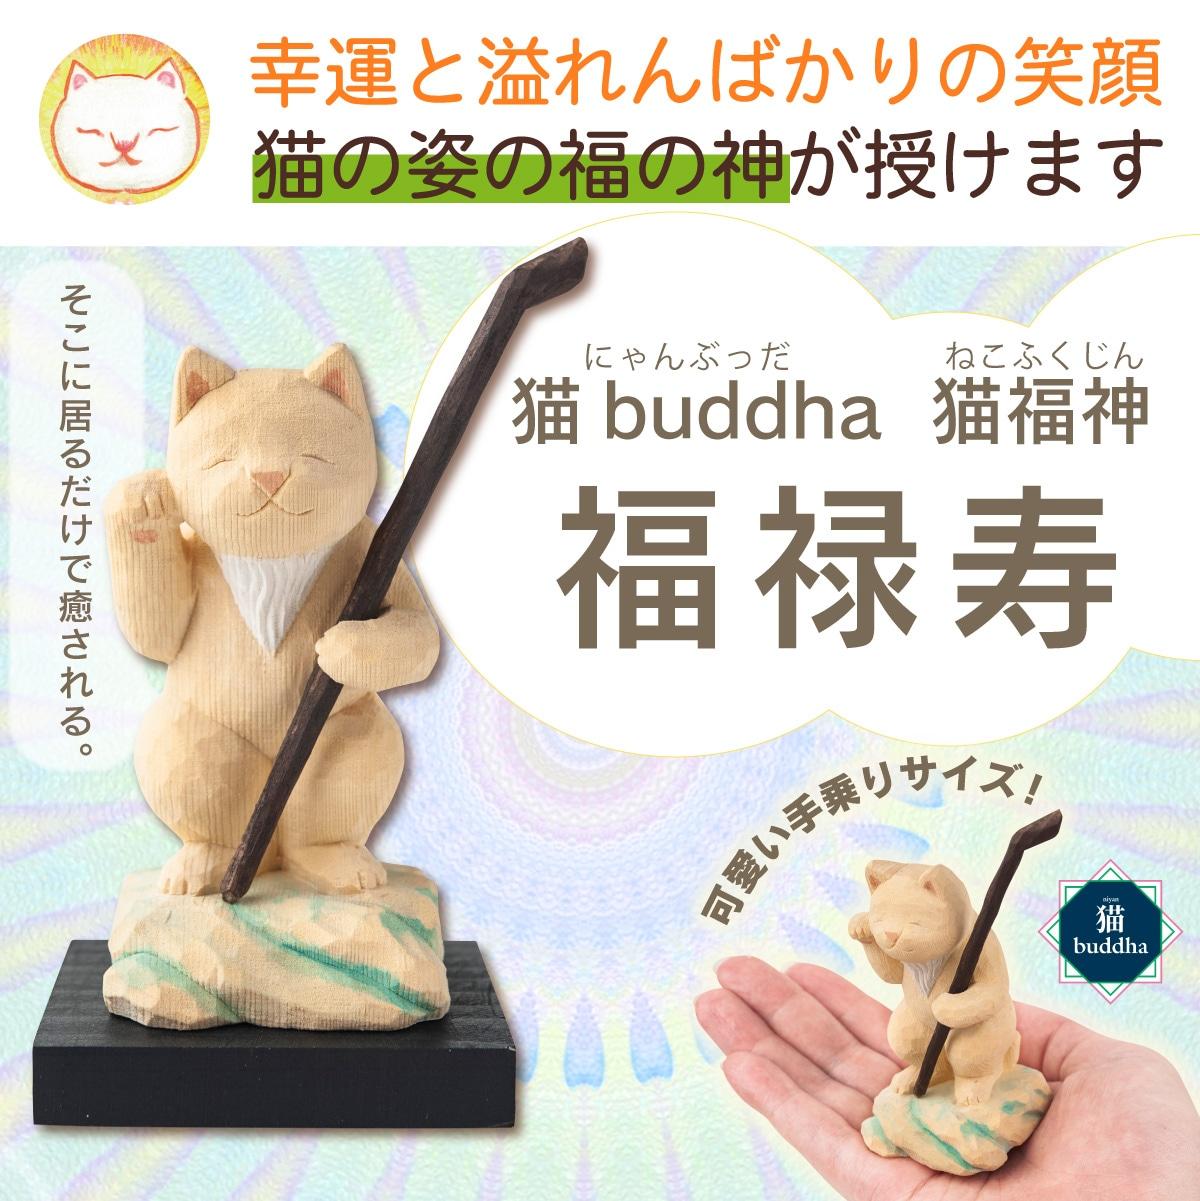 猫buddha 猫福神 福禄寿 開運グッズ